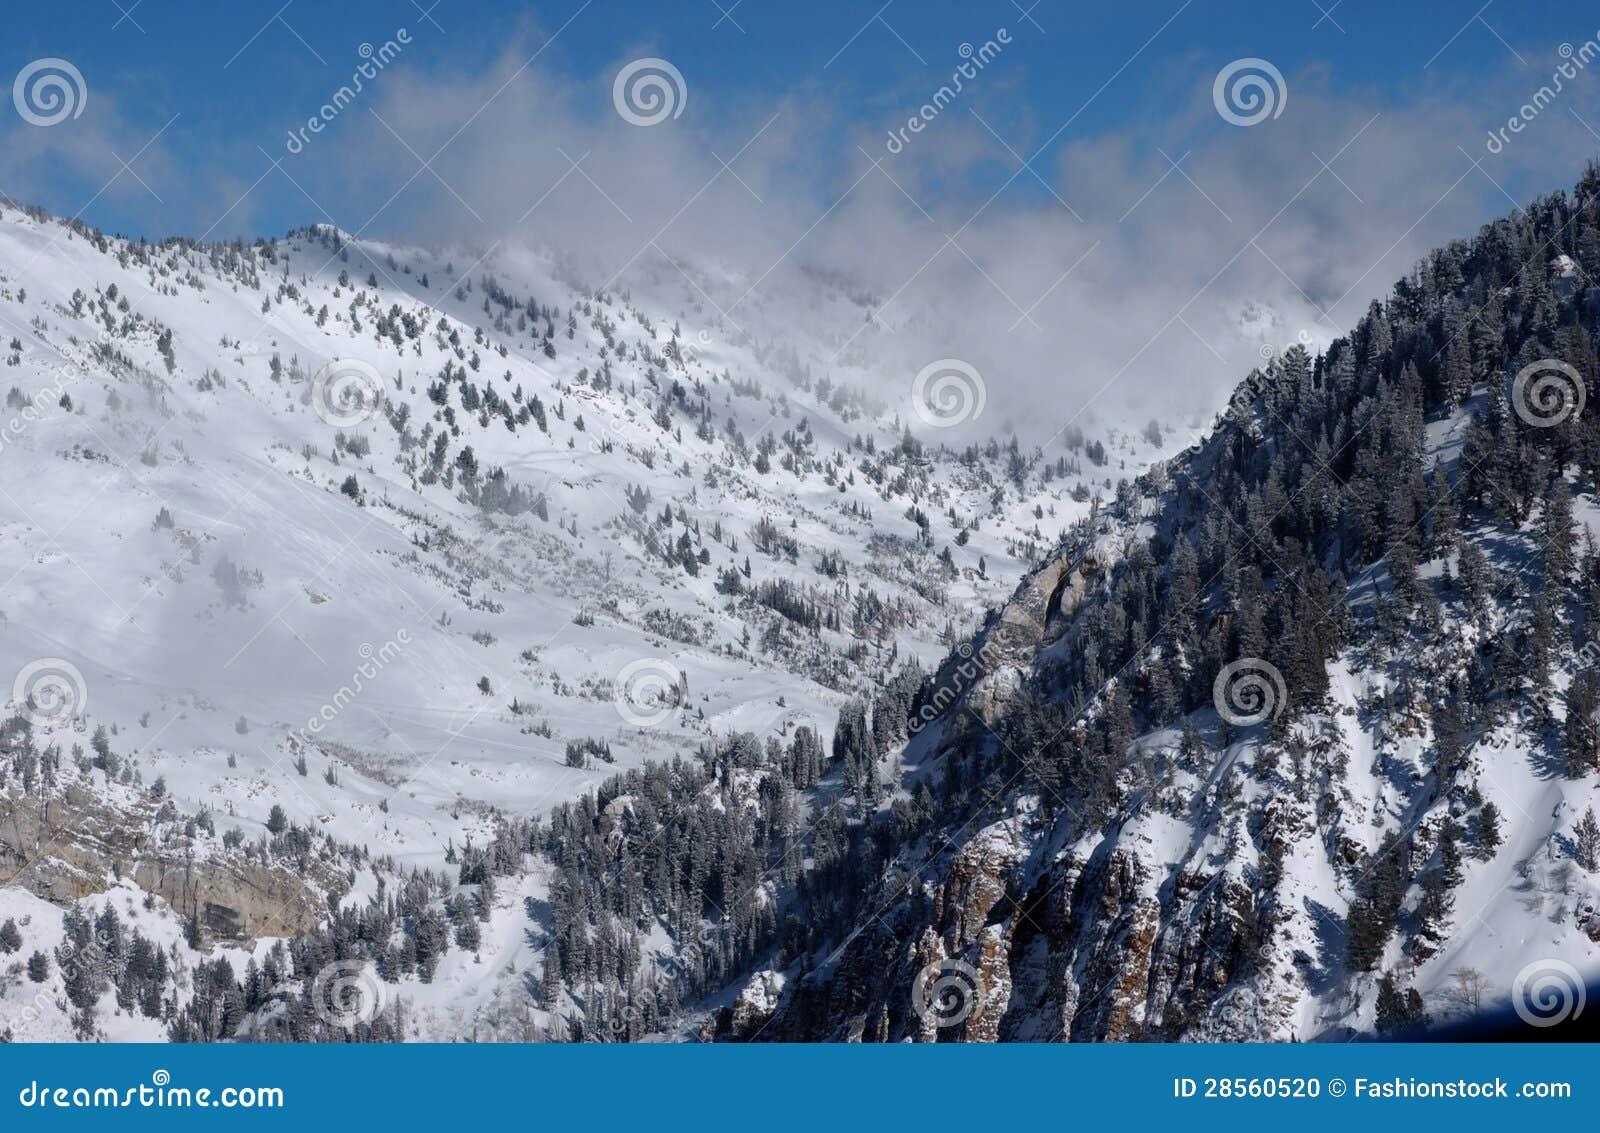 Utah skis coupon